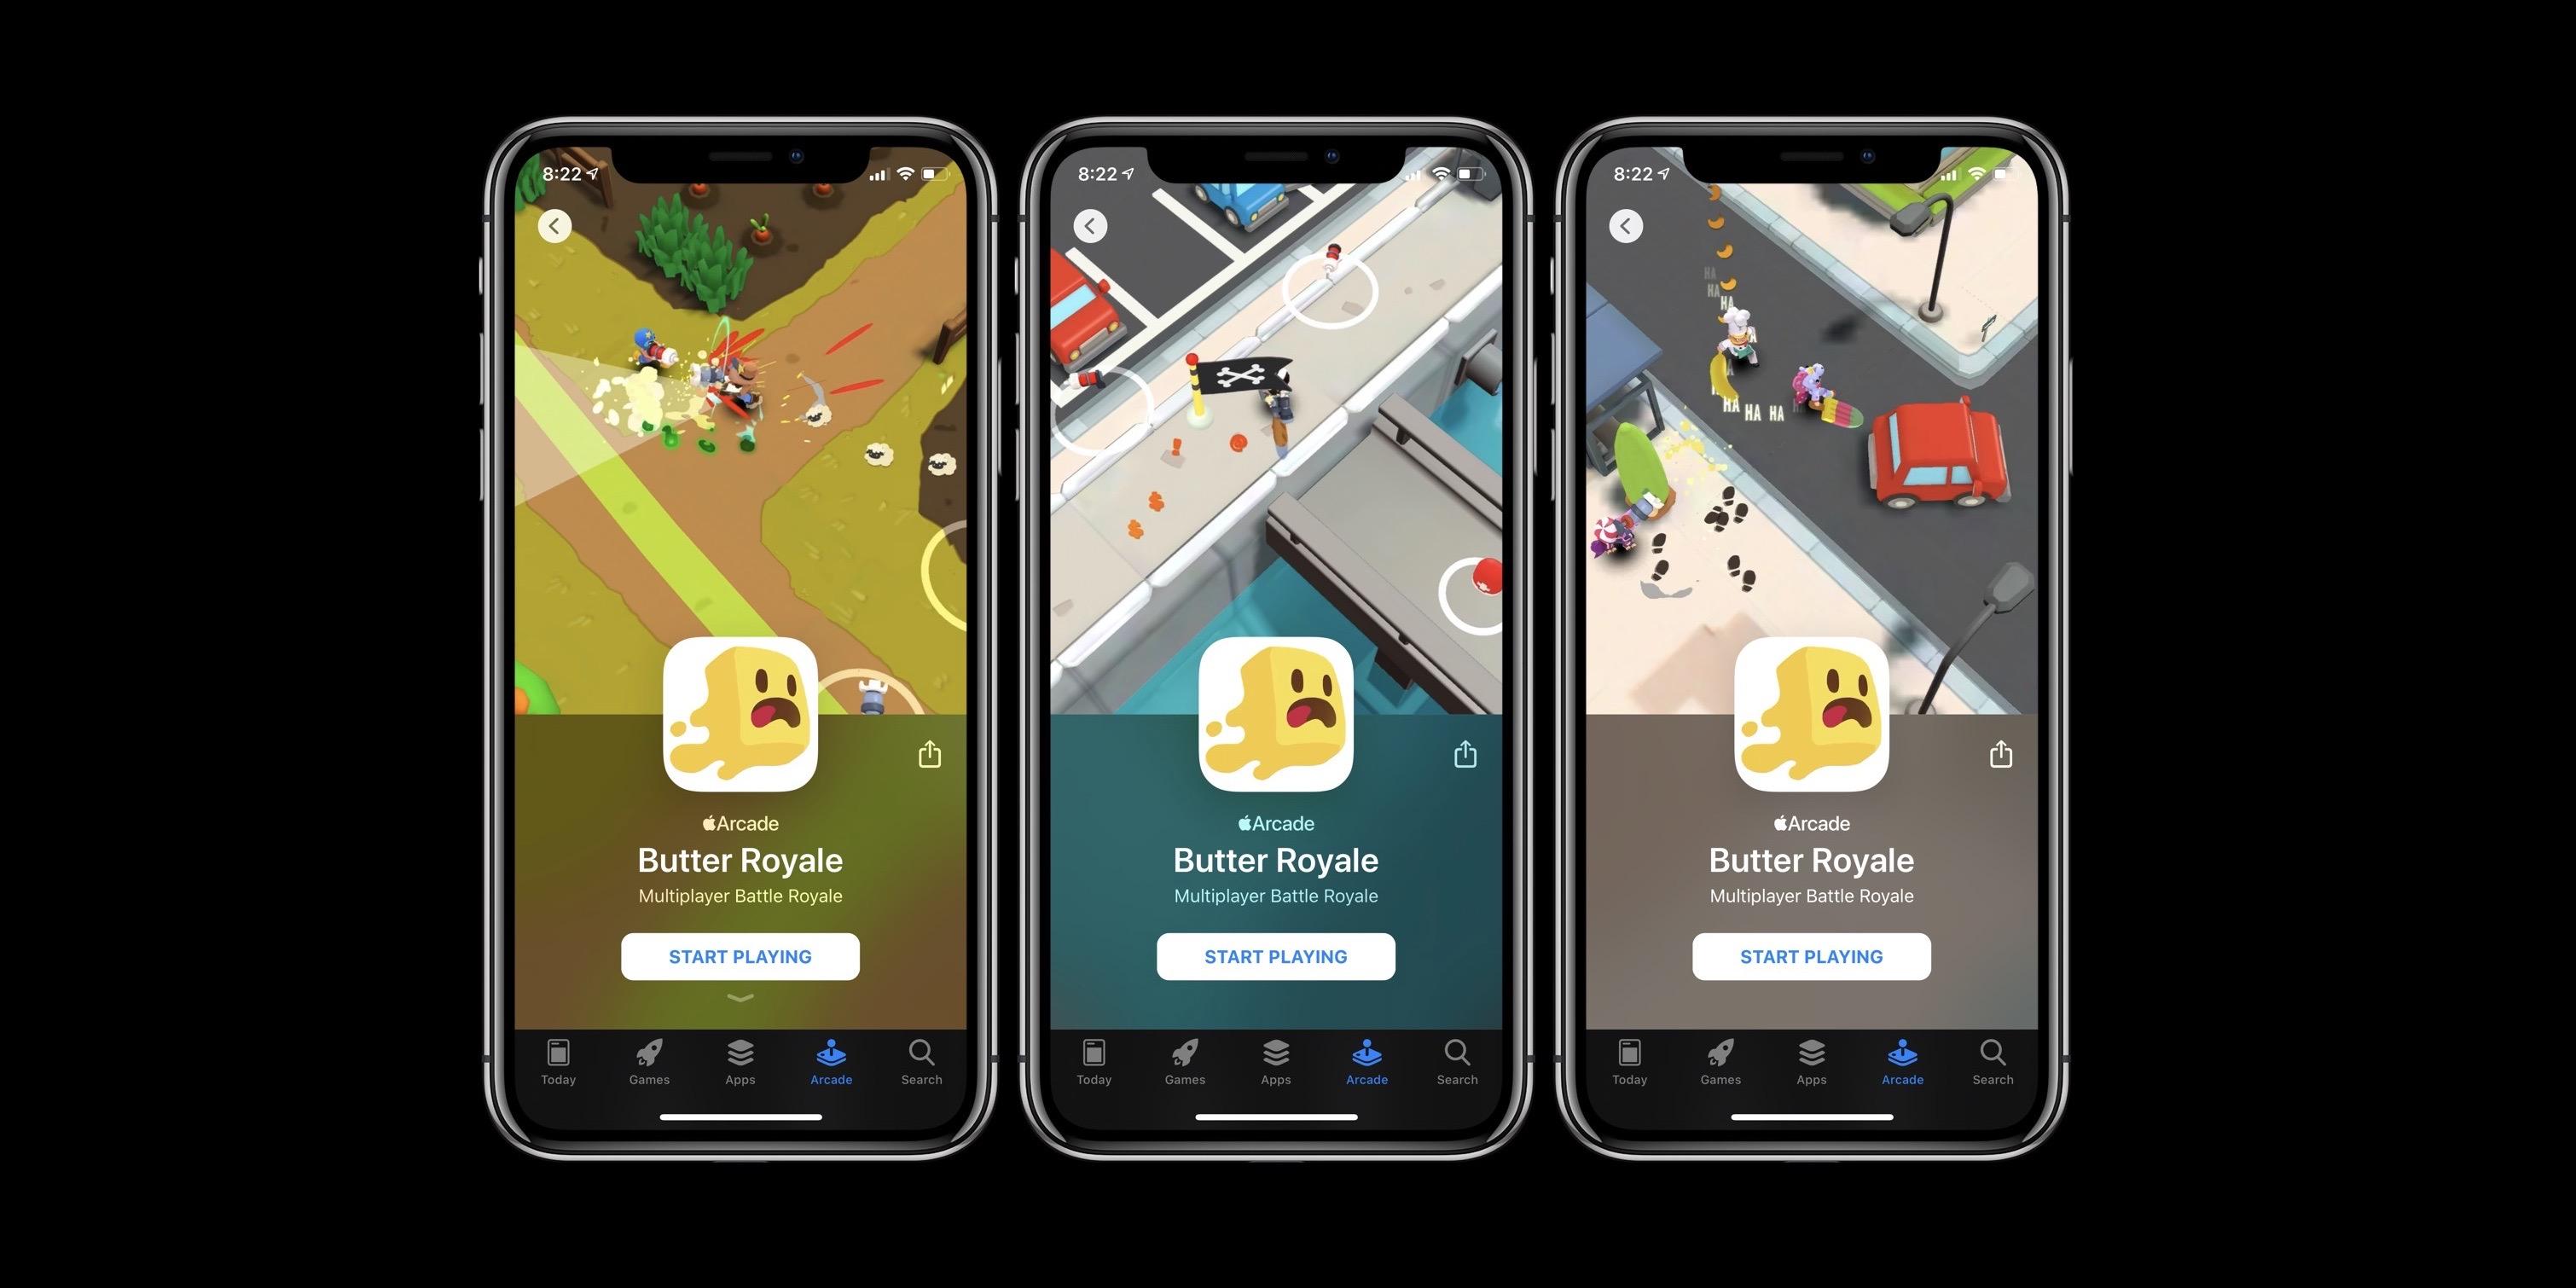 Apple Arcade new game 1/24